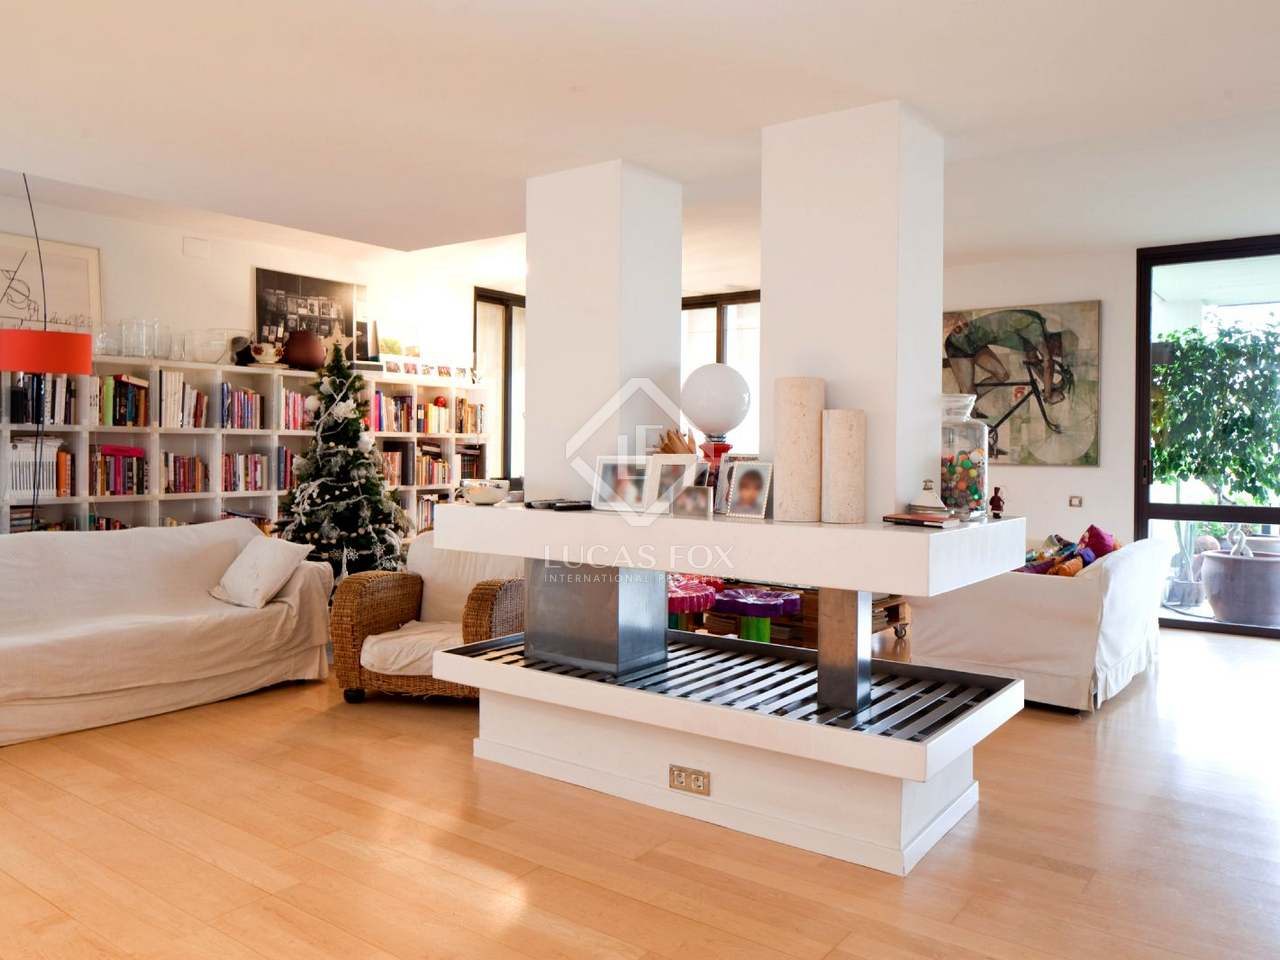 Luxury 4-bedroom apartment to buy in Turo Park, Barcelona